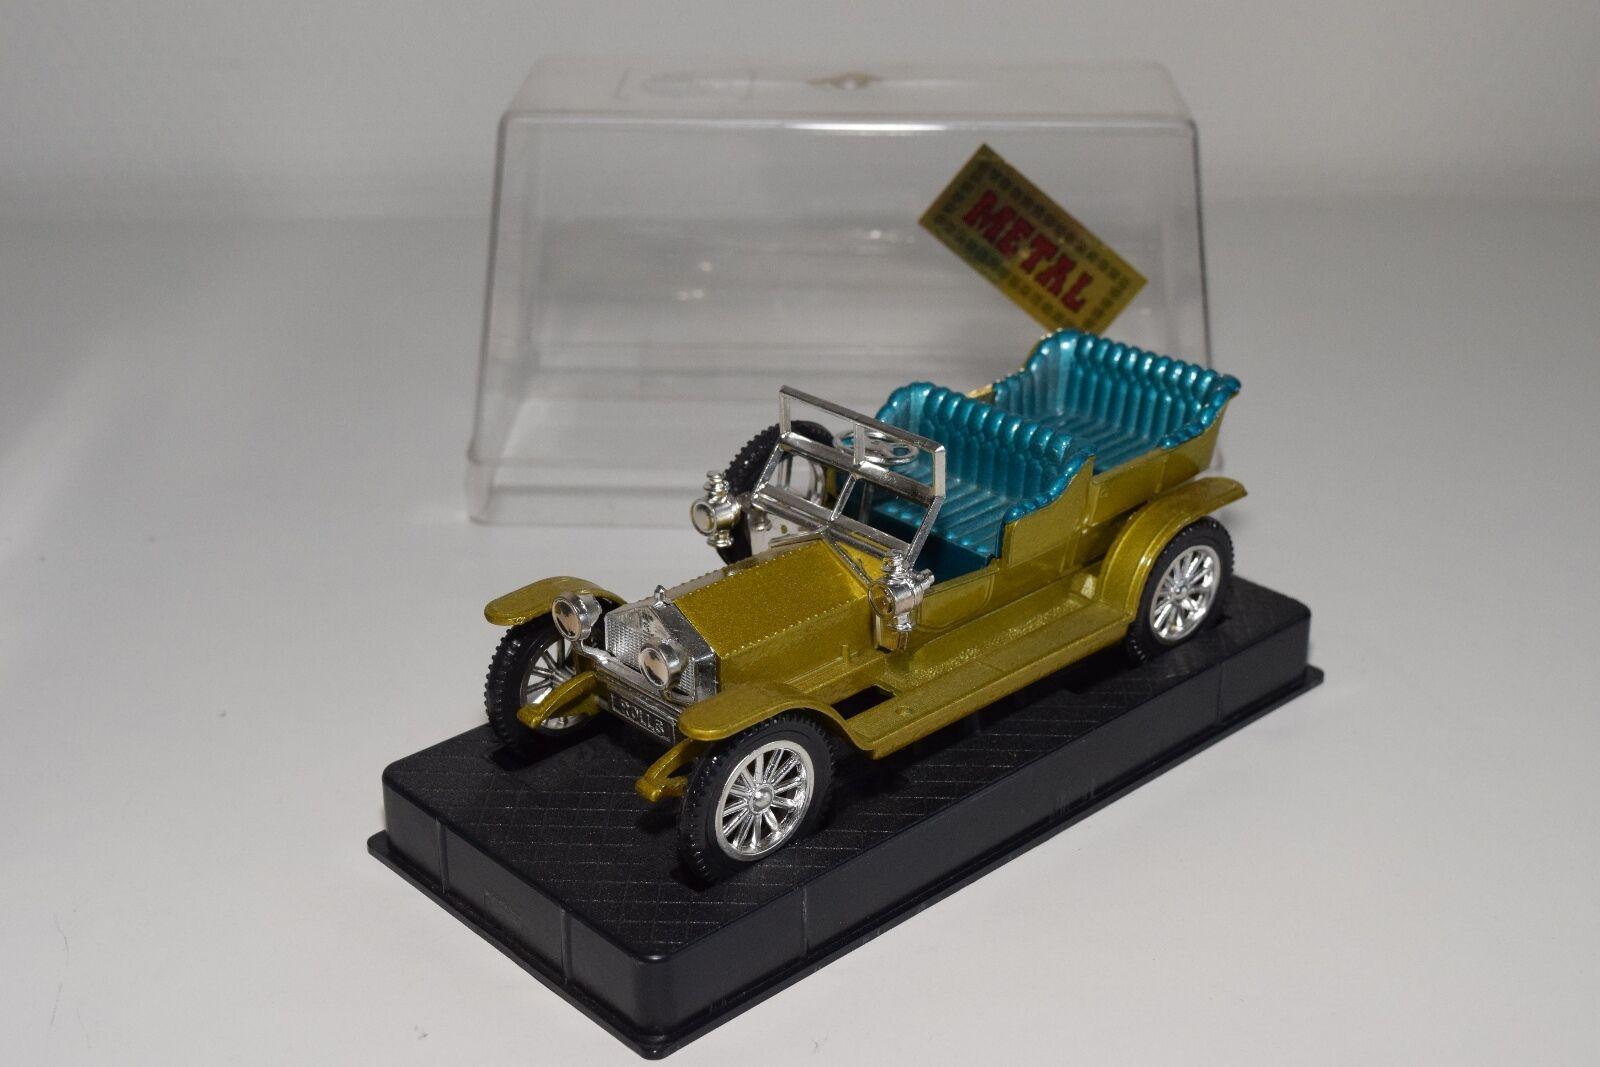 + NACORAL 3824 ROLLS ROYCE 1907 METALLIC MUSTARD giallo MINT BOXED RARE SELTEN